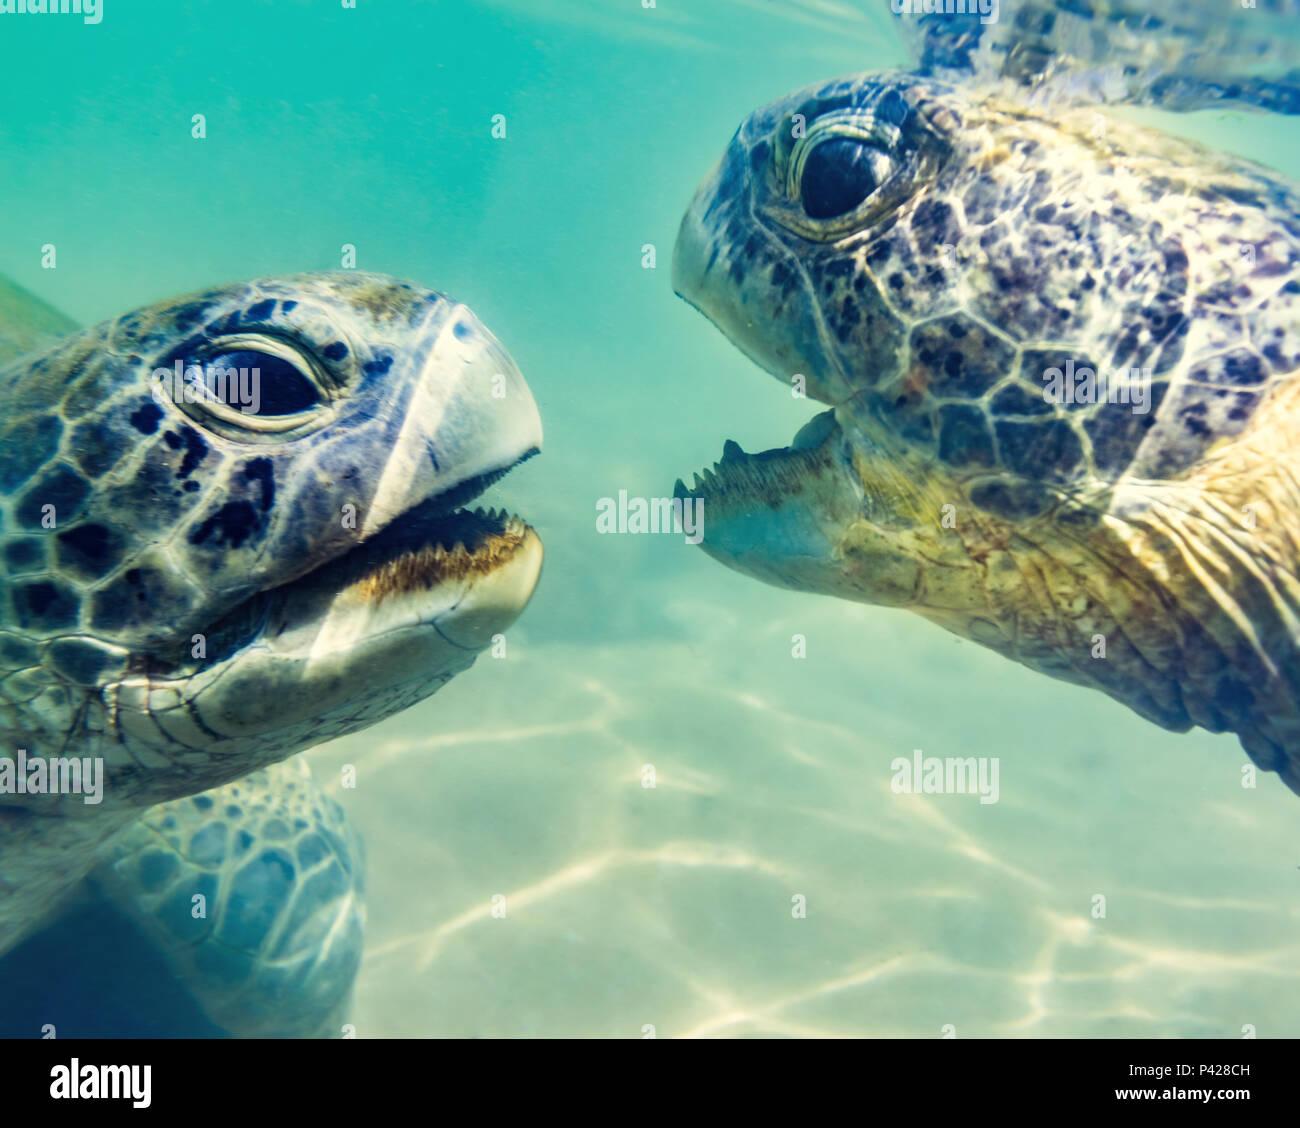 Turtles underwater at Hikkaduwa beach. Sri Lanka - Stock Image